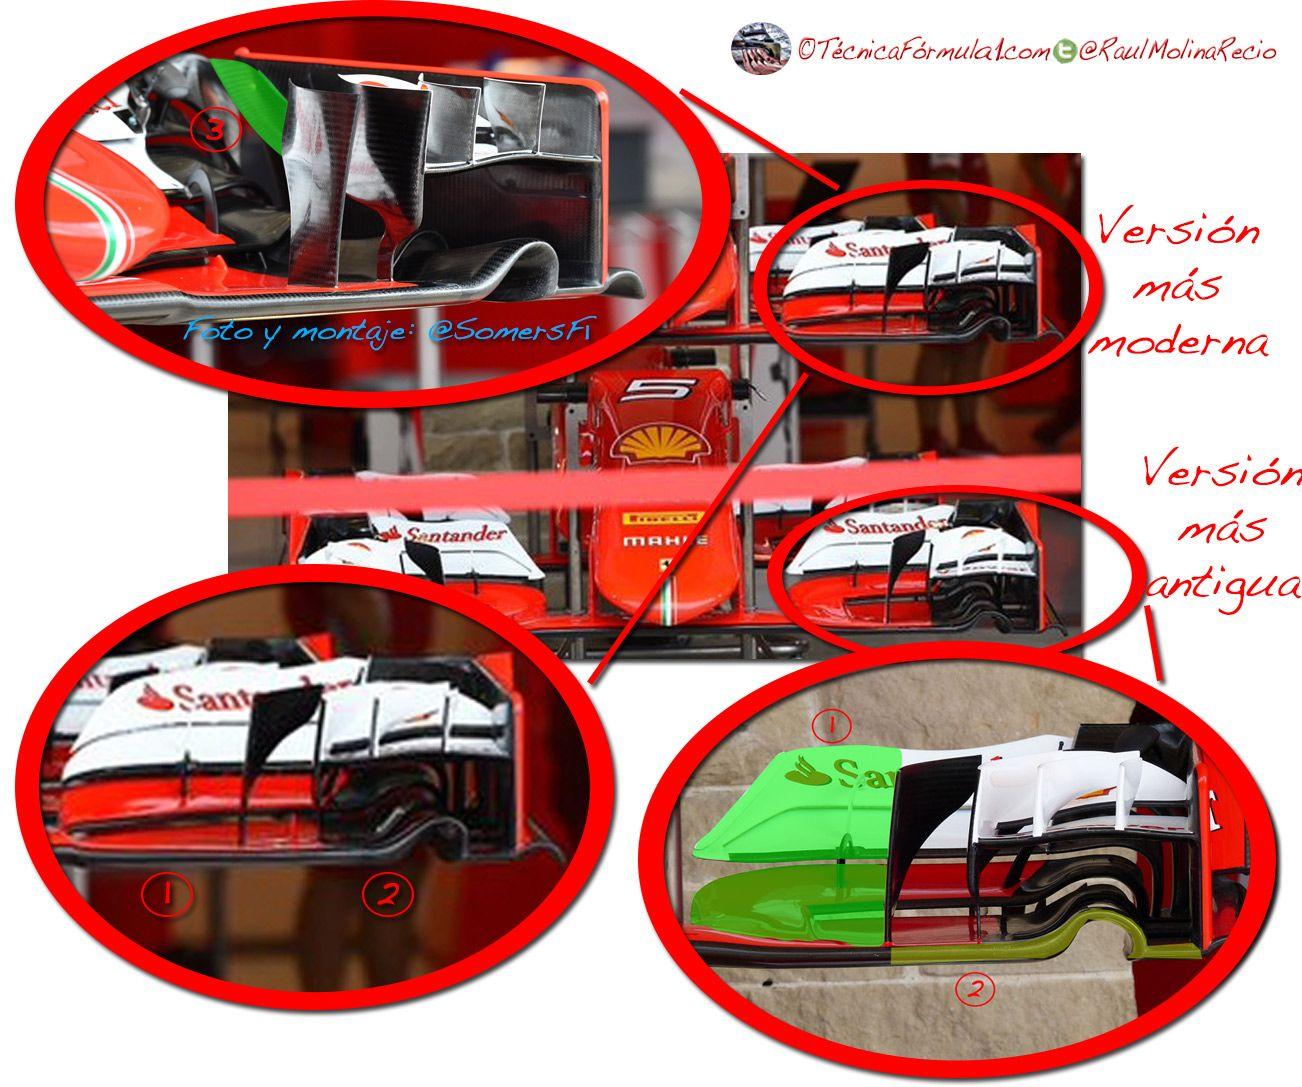 Análisis técnico de toda la parrilla en el GP de EE.UU. F1 2015  #F1 #Formula1 #USGP